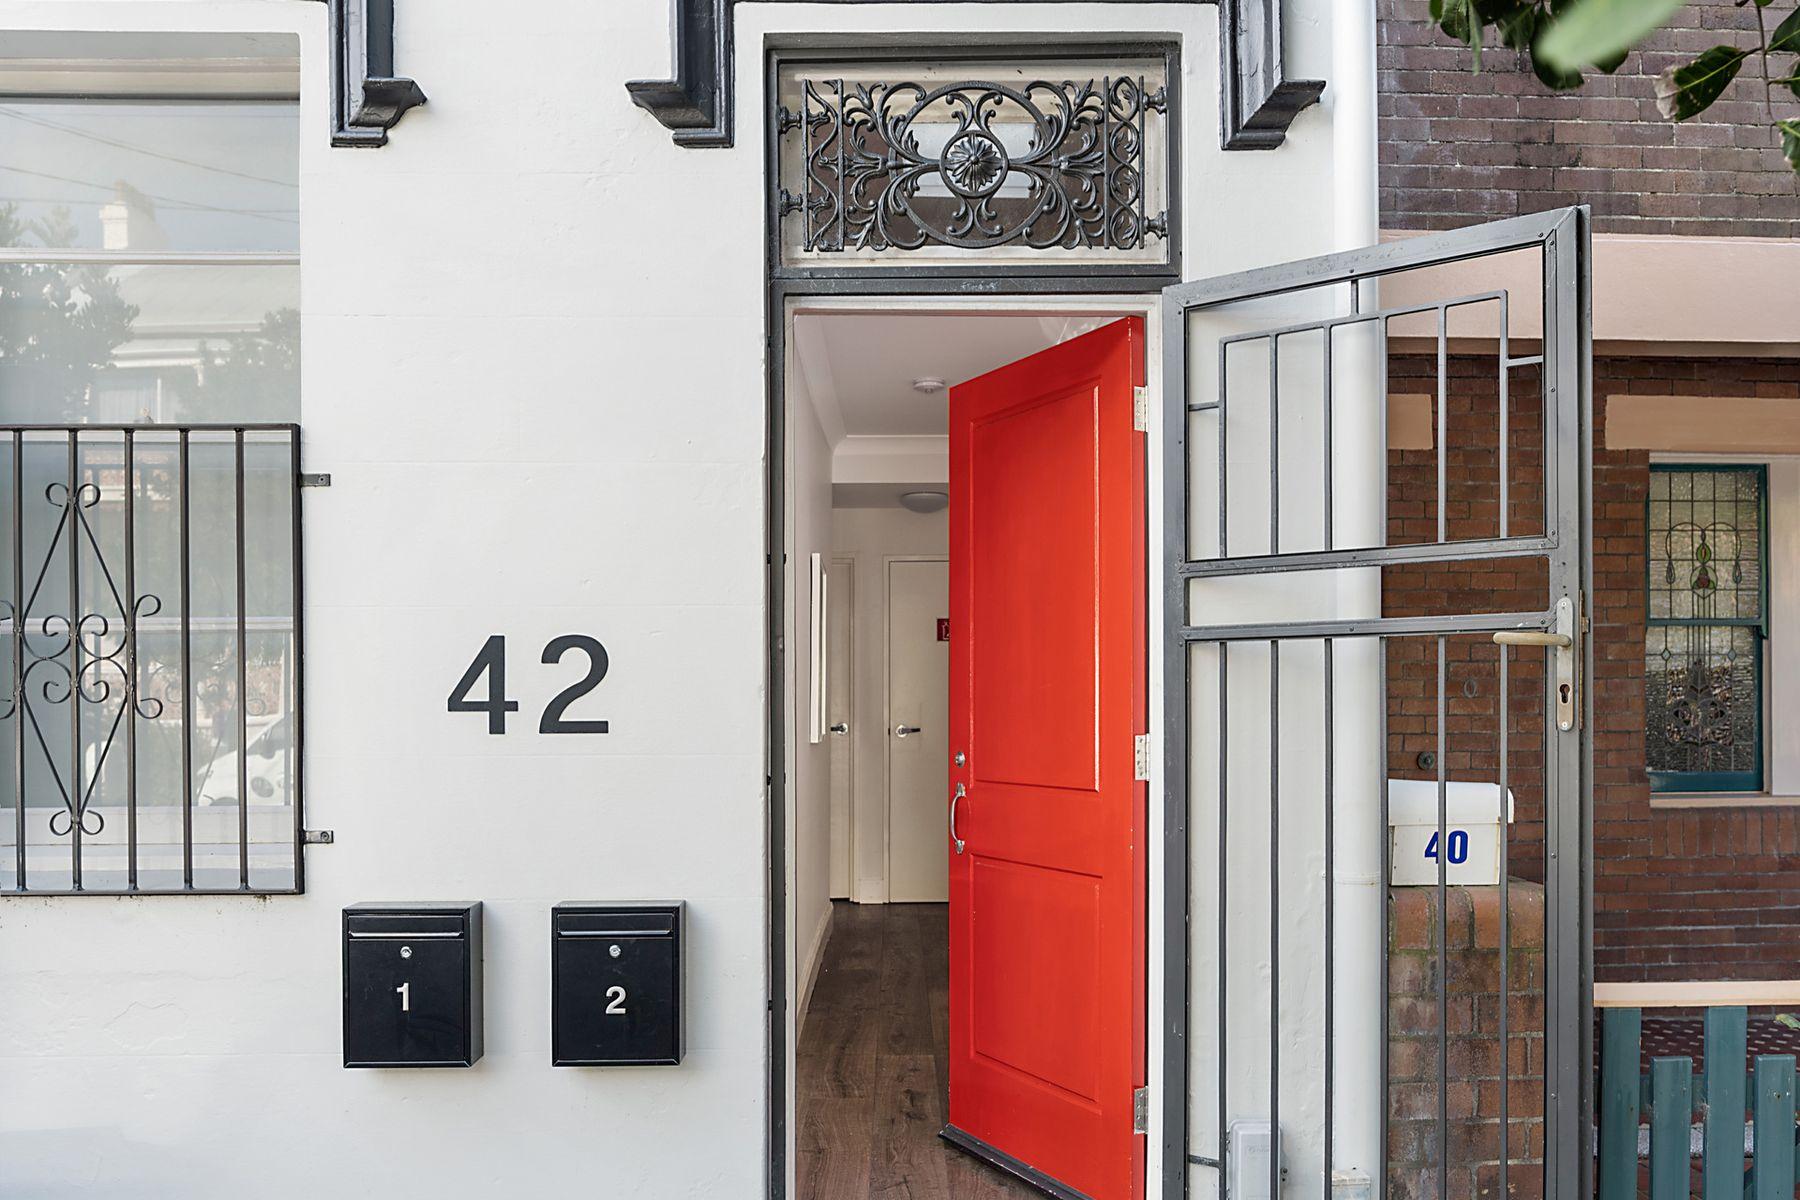 2/42 Tyrrell Street, The Hill, NSW 2300